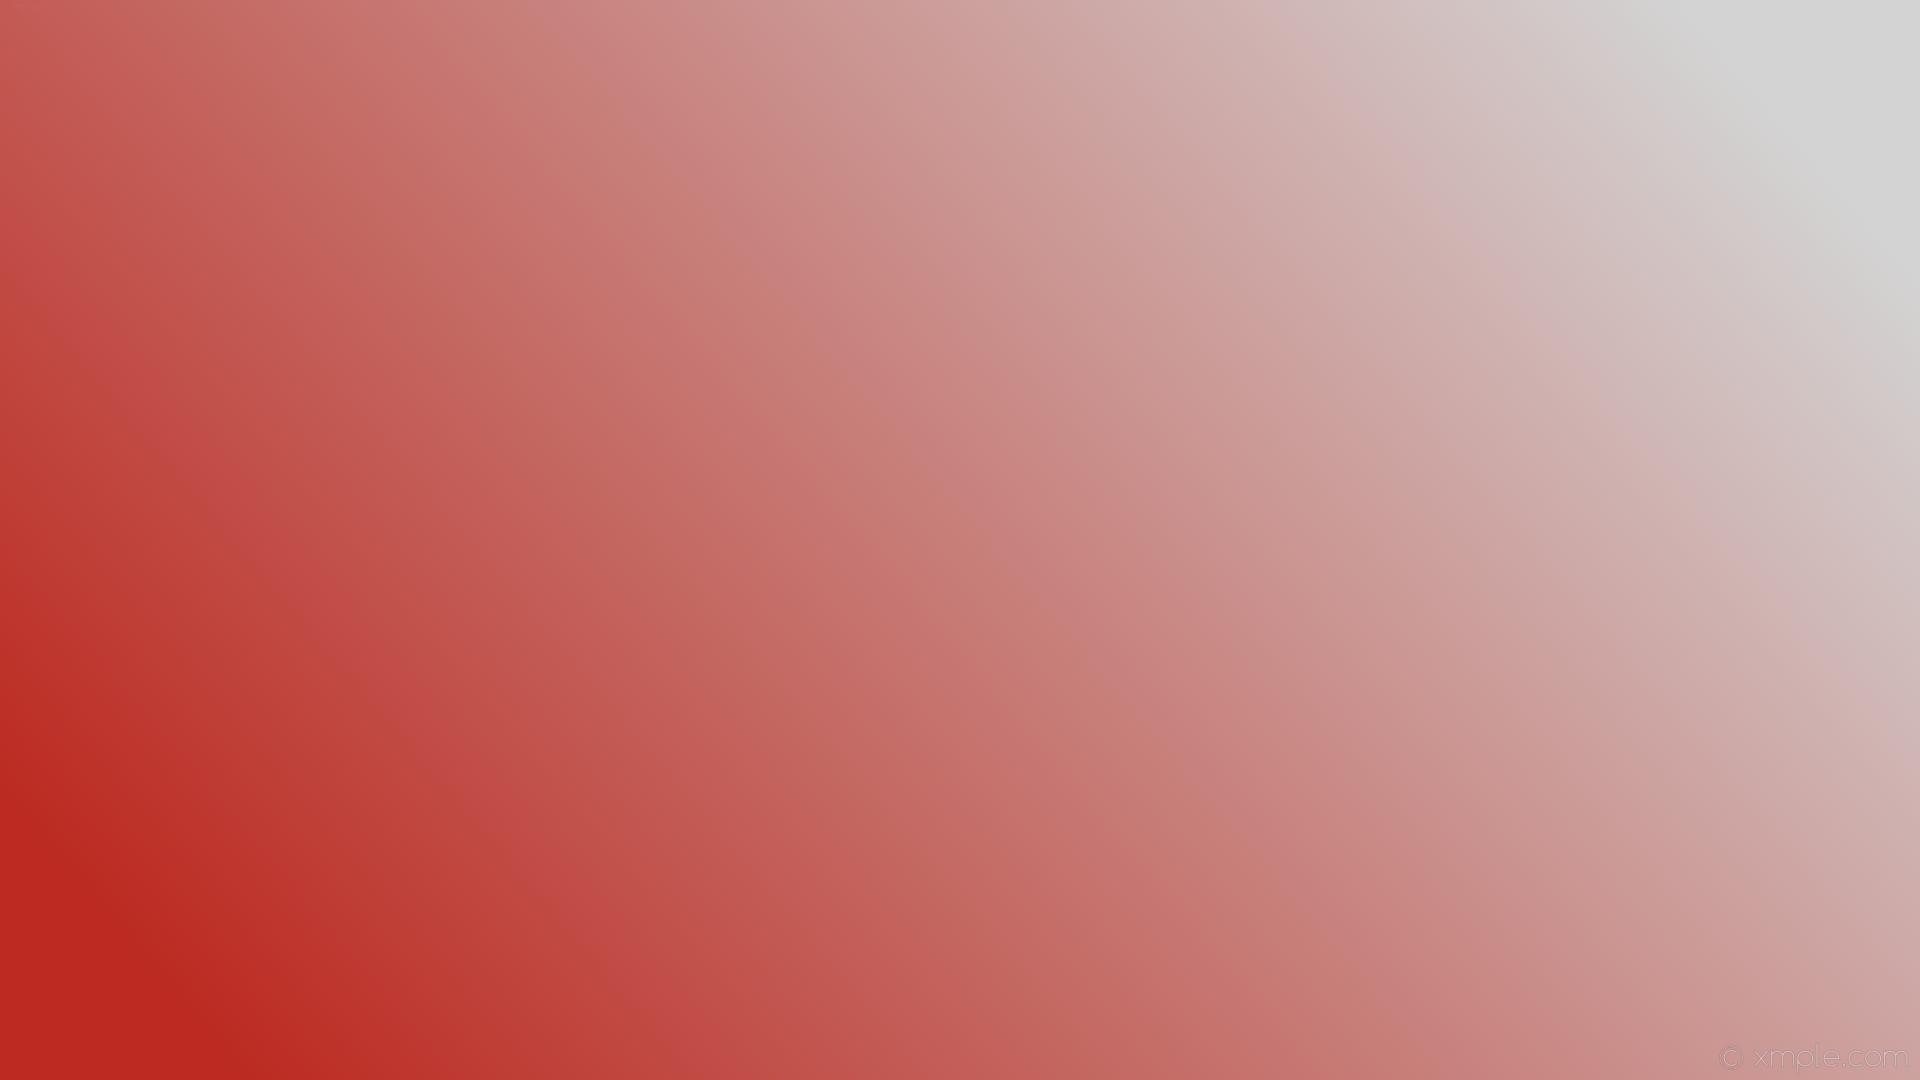 wallpaper grey linear red gradient light gray #bc2a21 #d3d3d3 195°